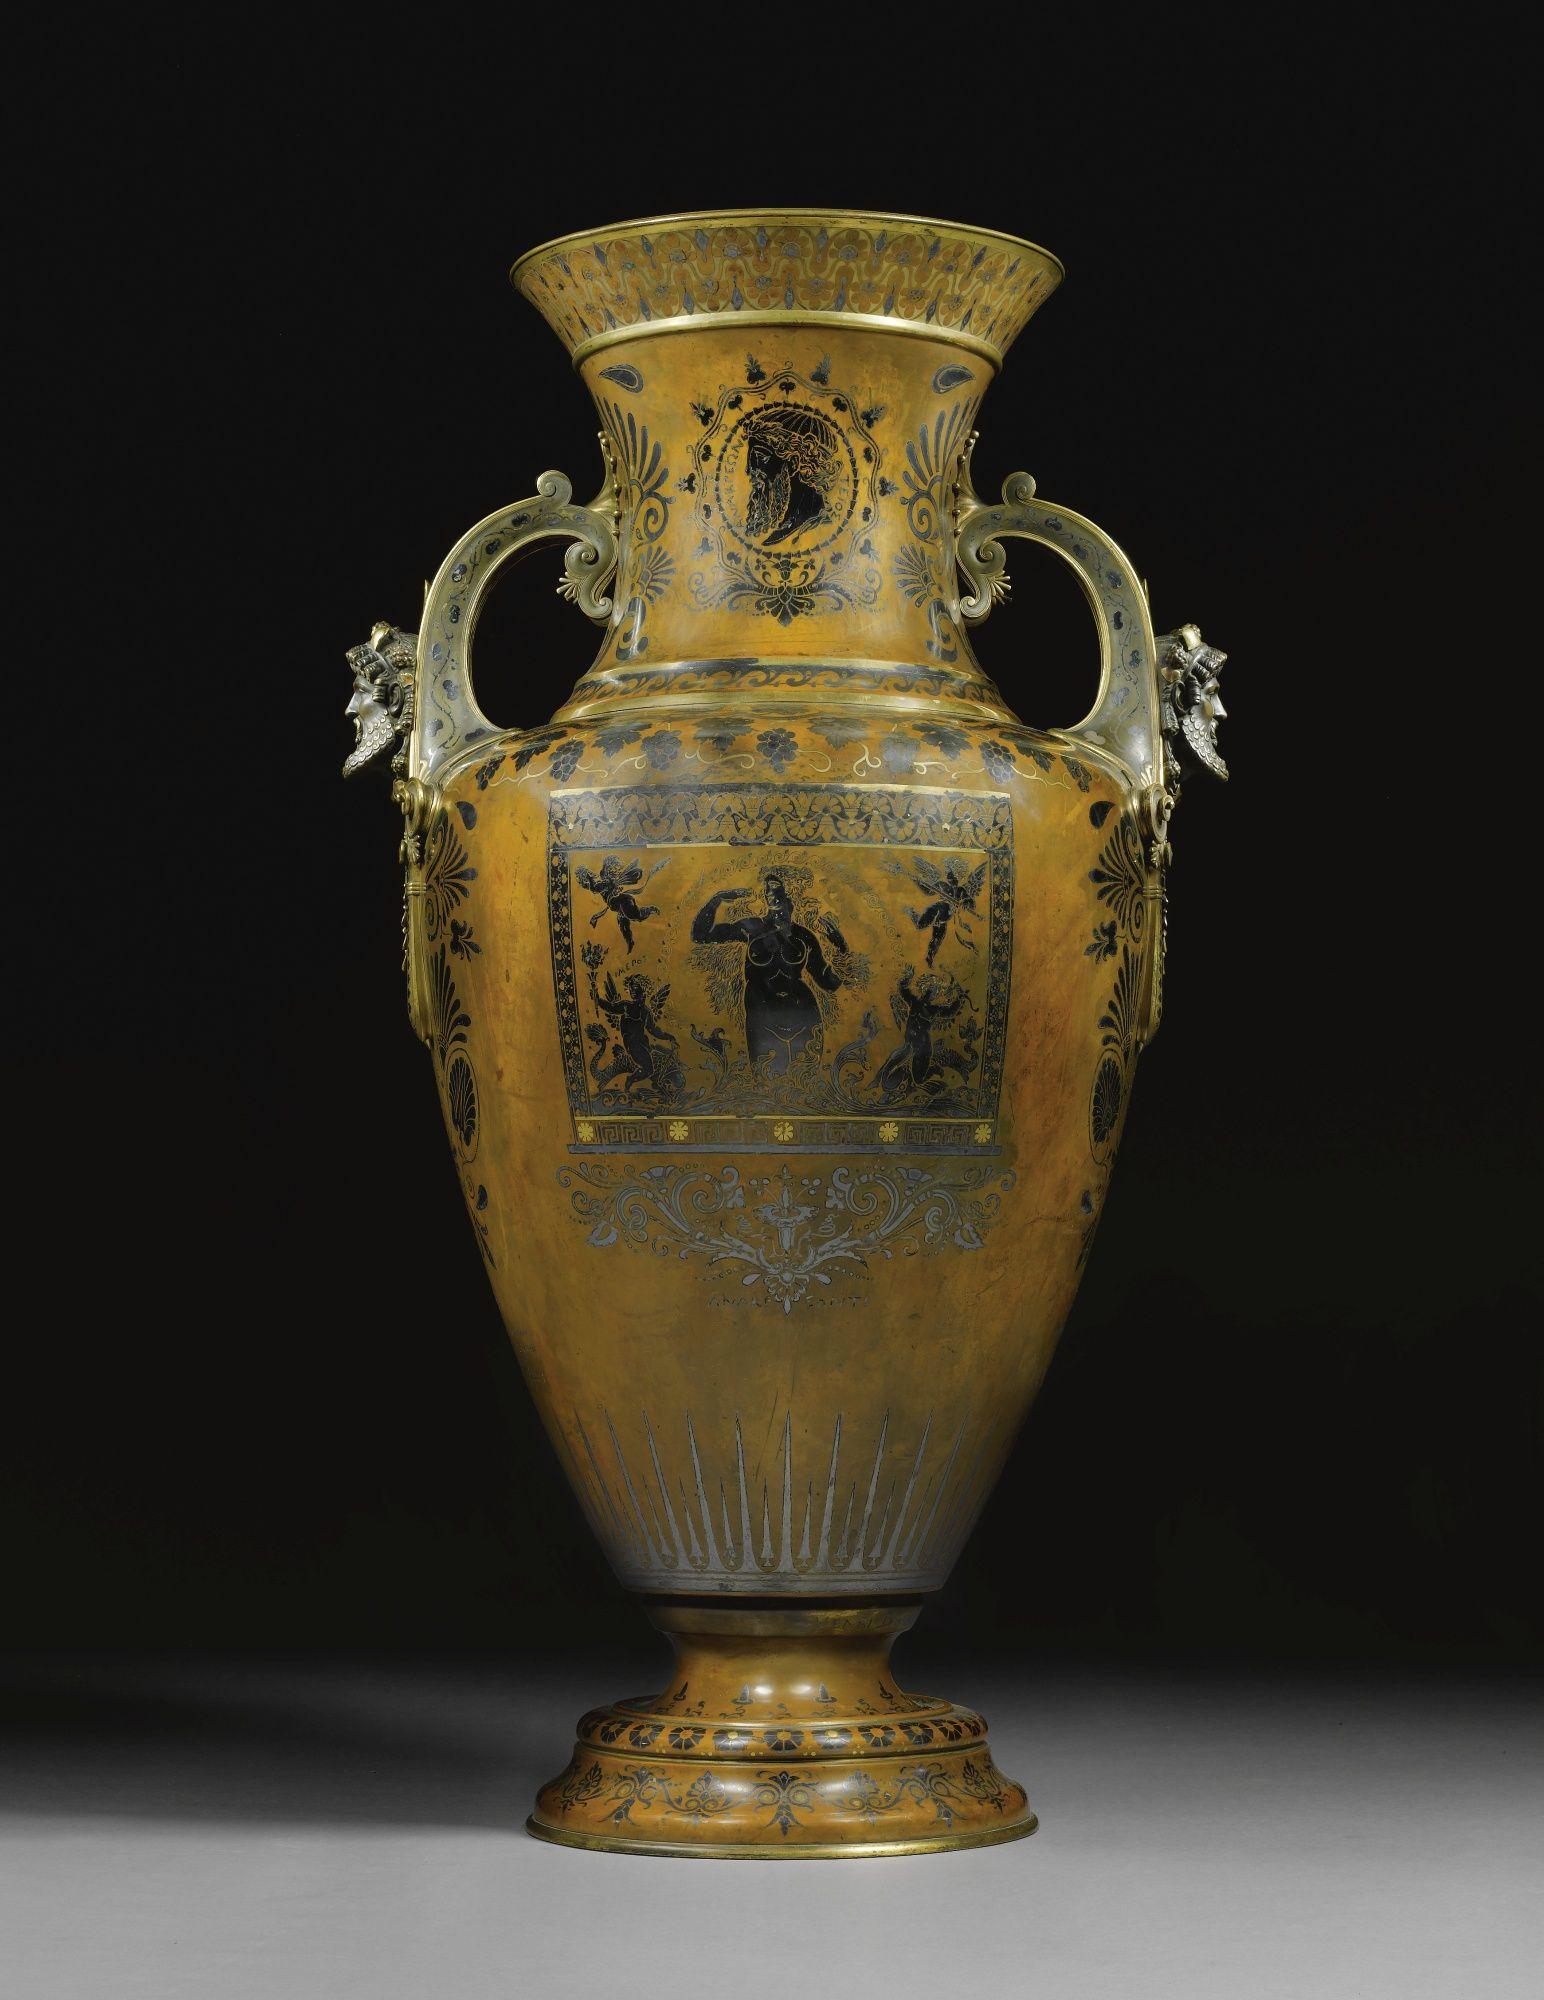 A monumental copper, silver and silver-gilt vase, designed by Émile-Auguste Reiber for Christofle, Paris, 1873 | lot | Sotheby's